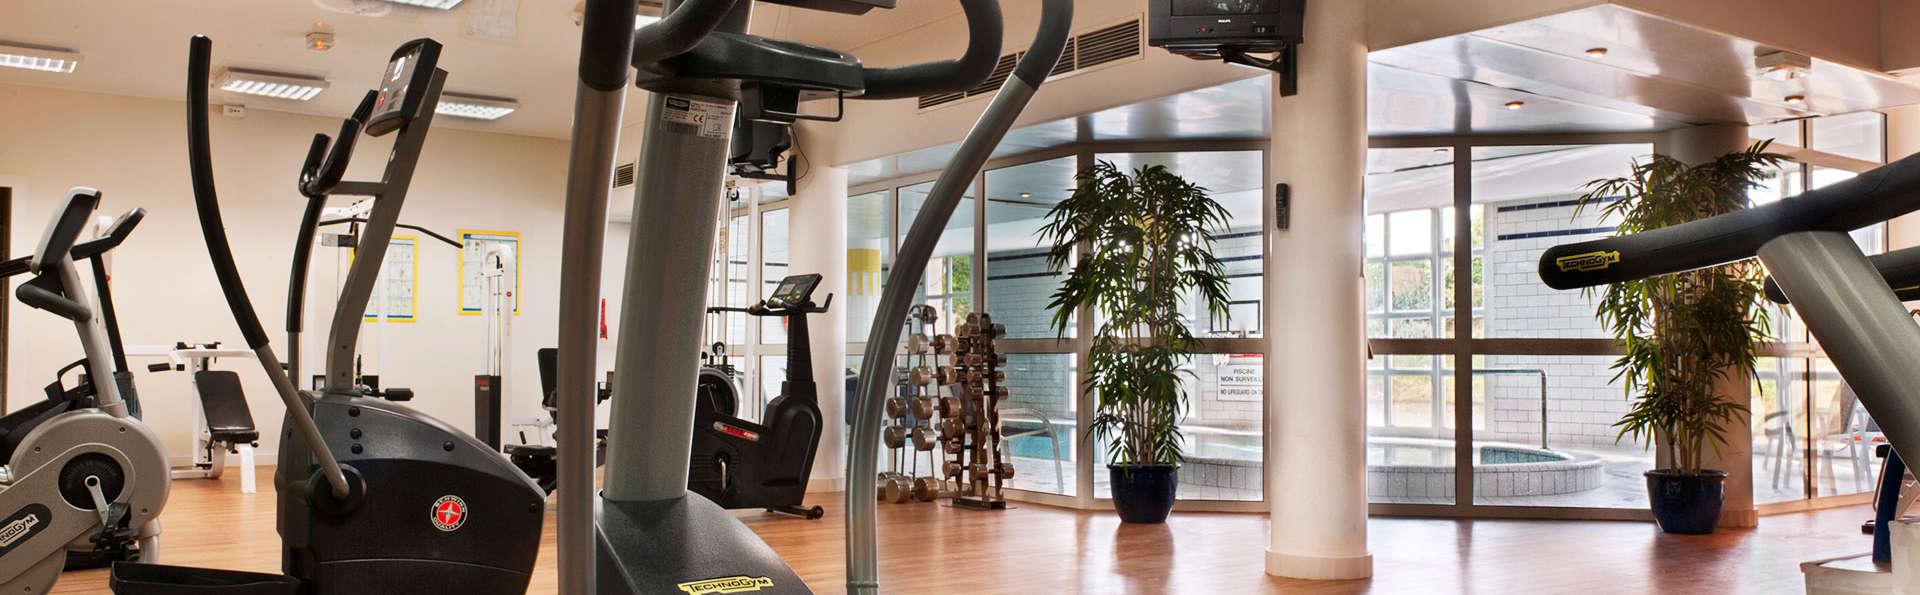 Mercure Chantilly Resort & Conventions - EDIT_gym.jpg